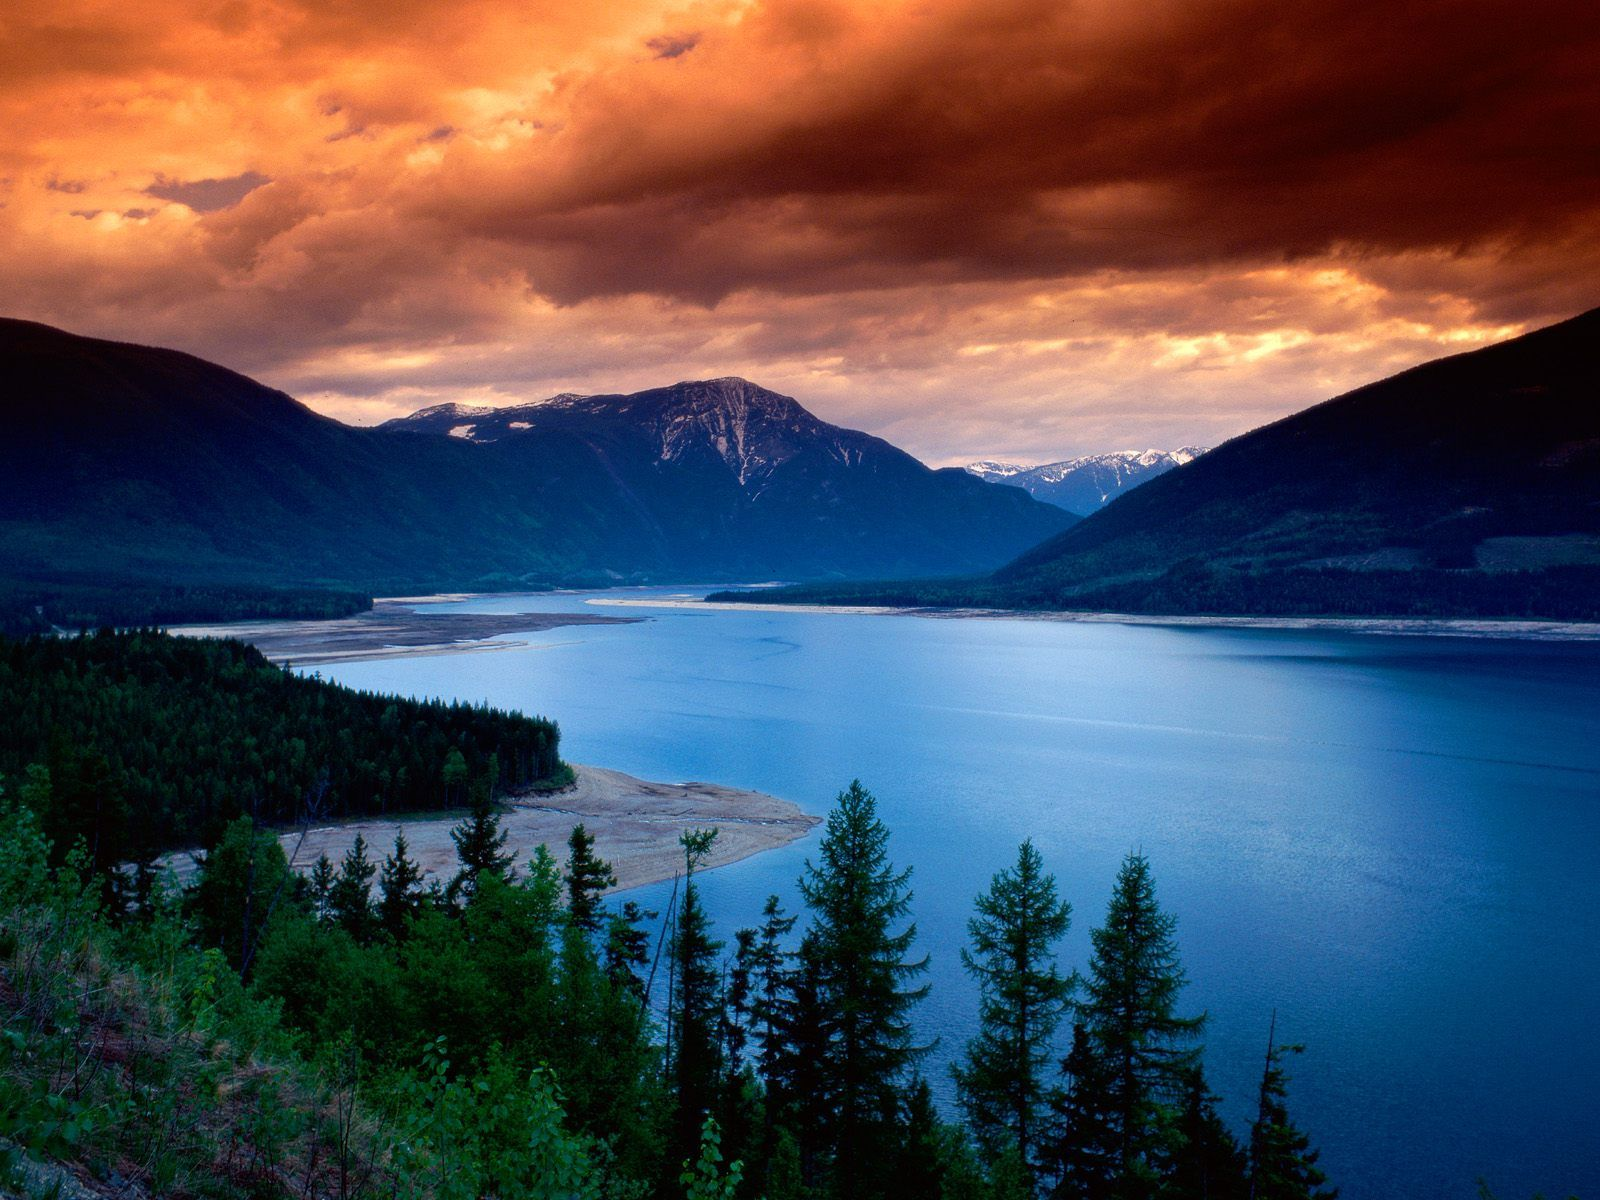 Upper Arrow Lake, British Columbia, Canada Scenic